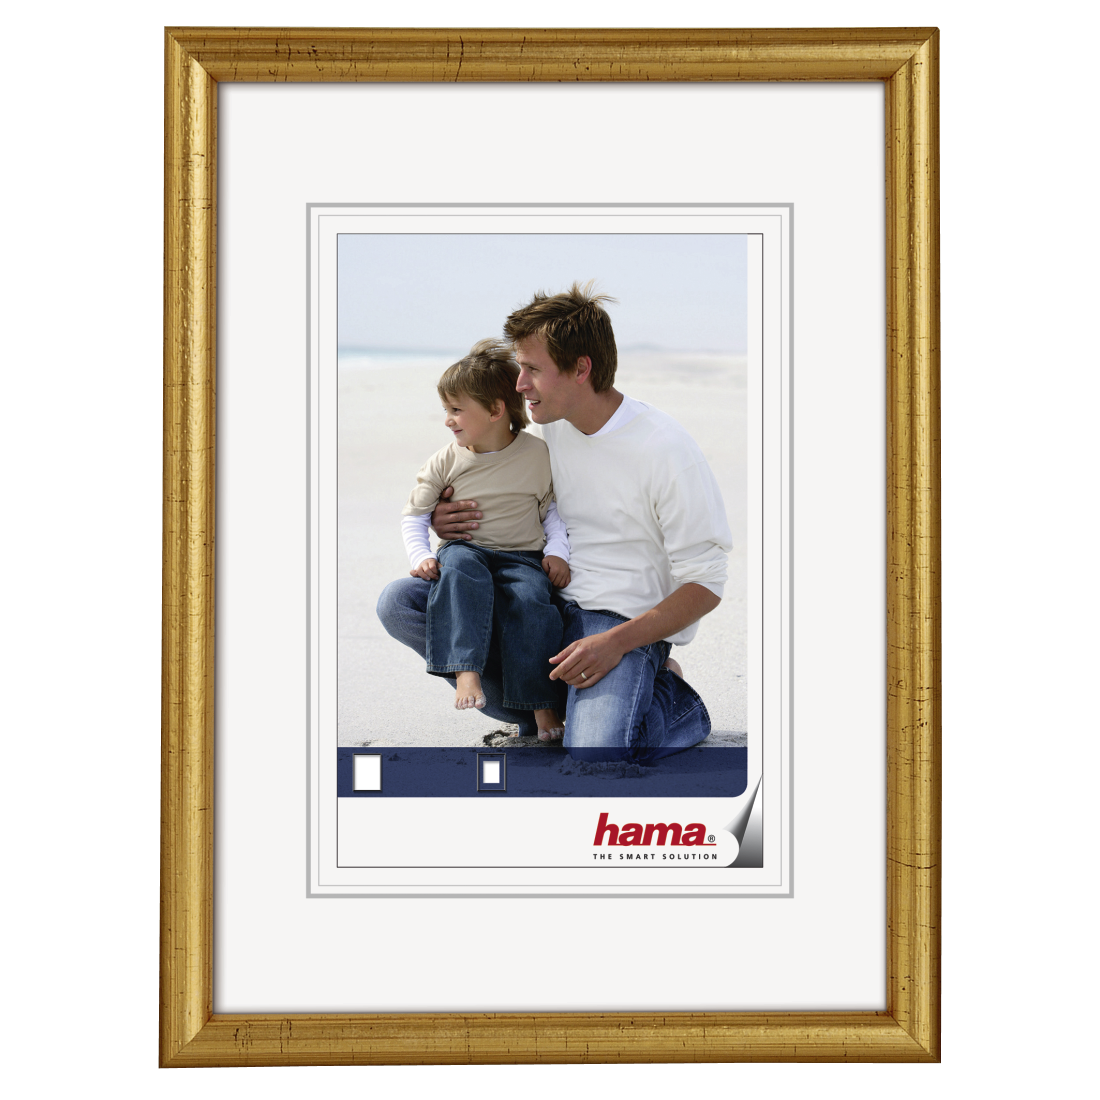 00064709 Hama Wooden Frame Oregon Gold 18 X 24 Cm Hama De